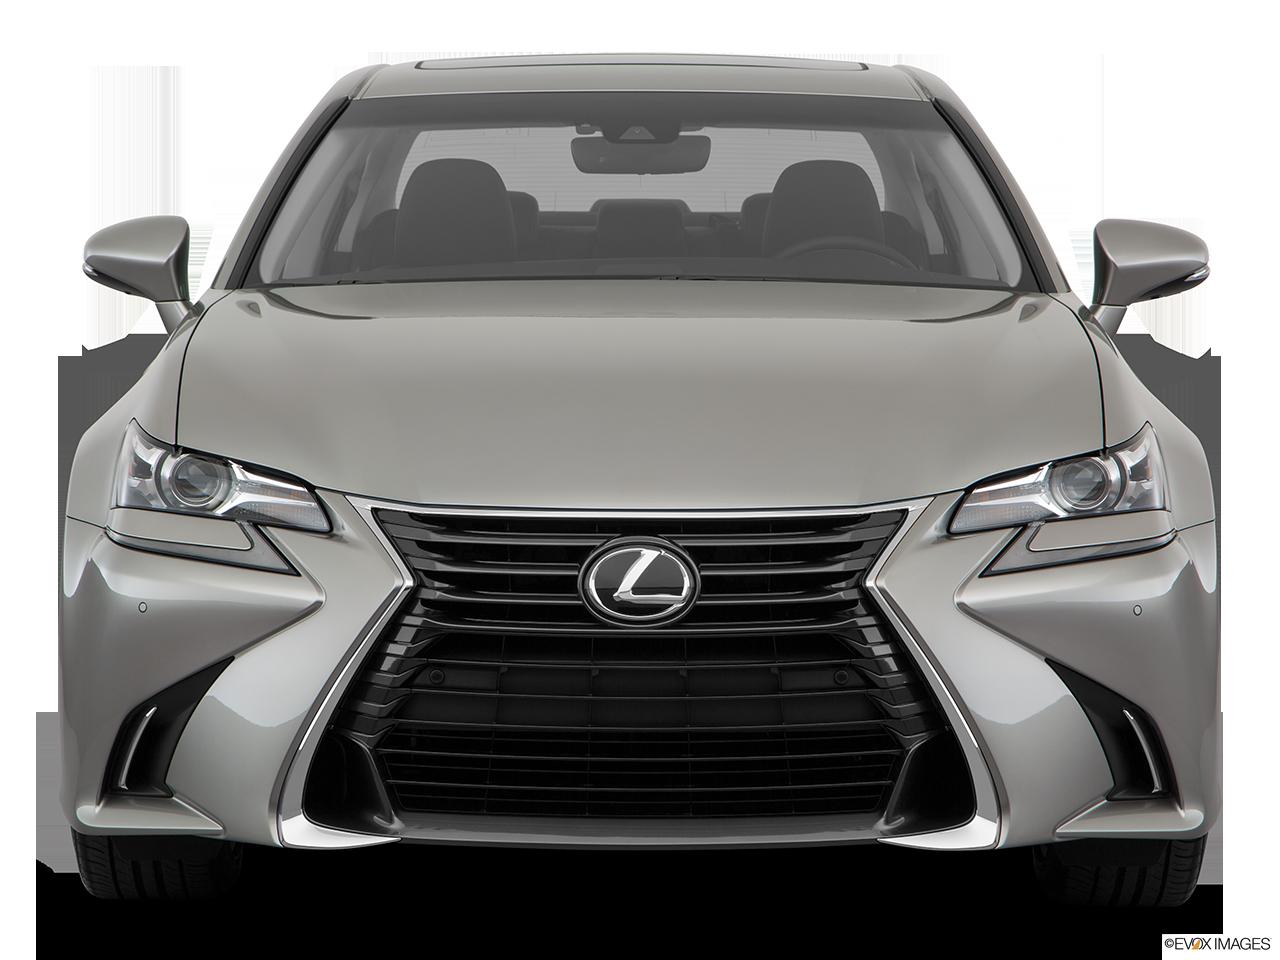 2019 Lexus GS 350 photo